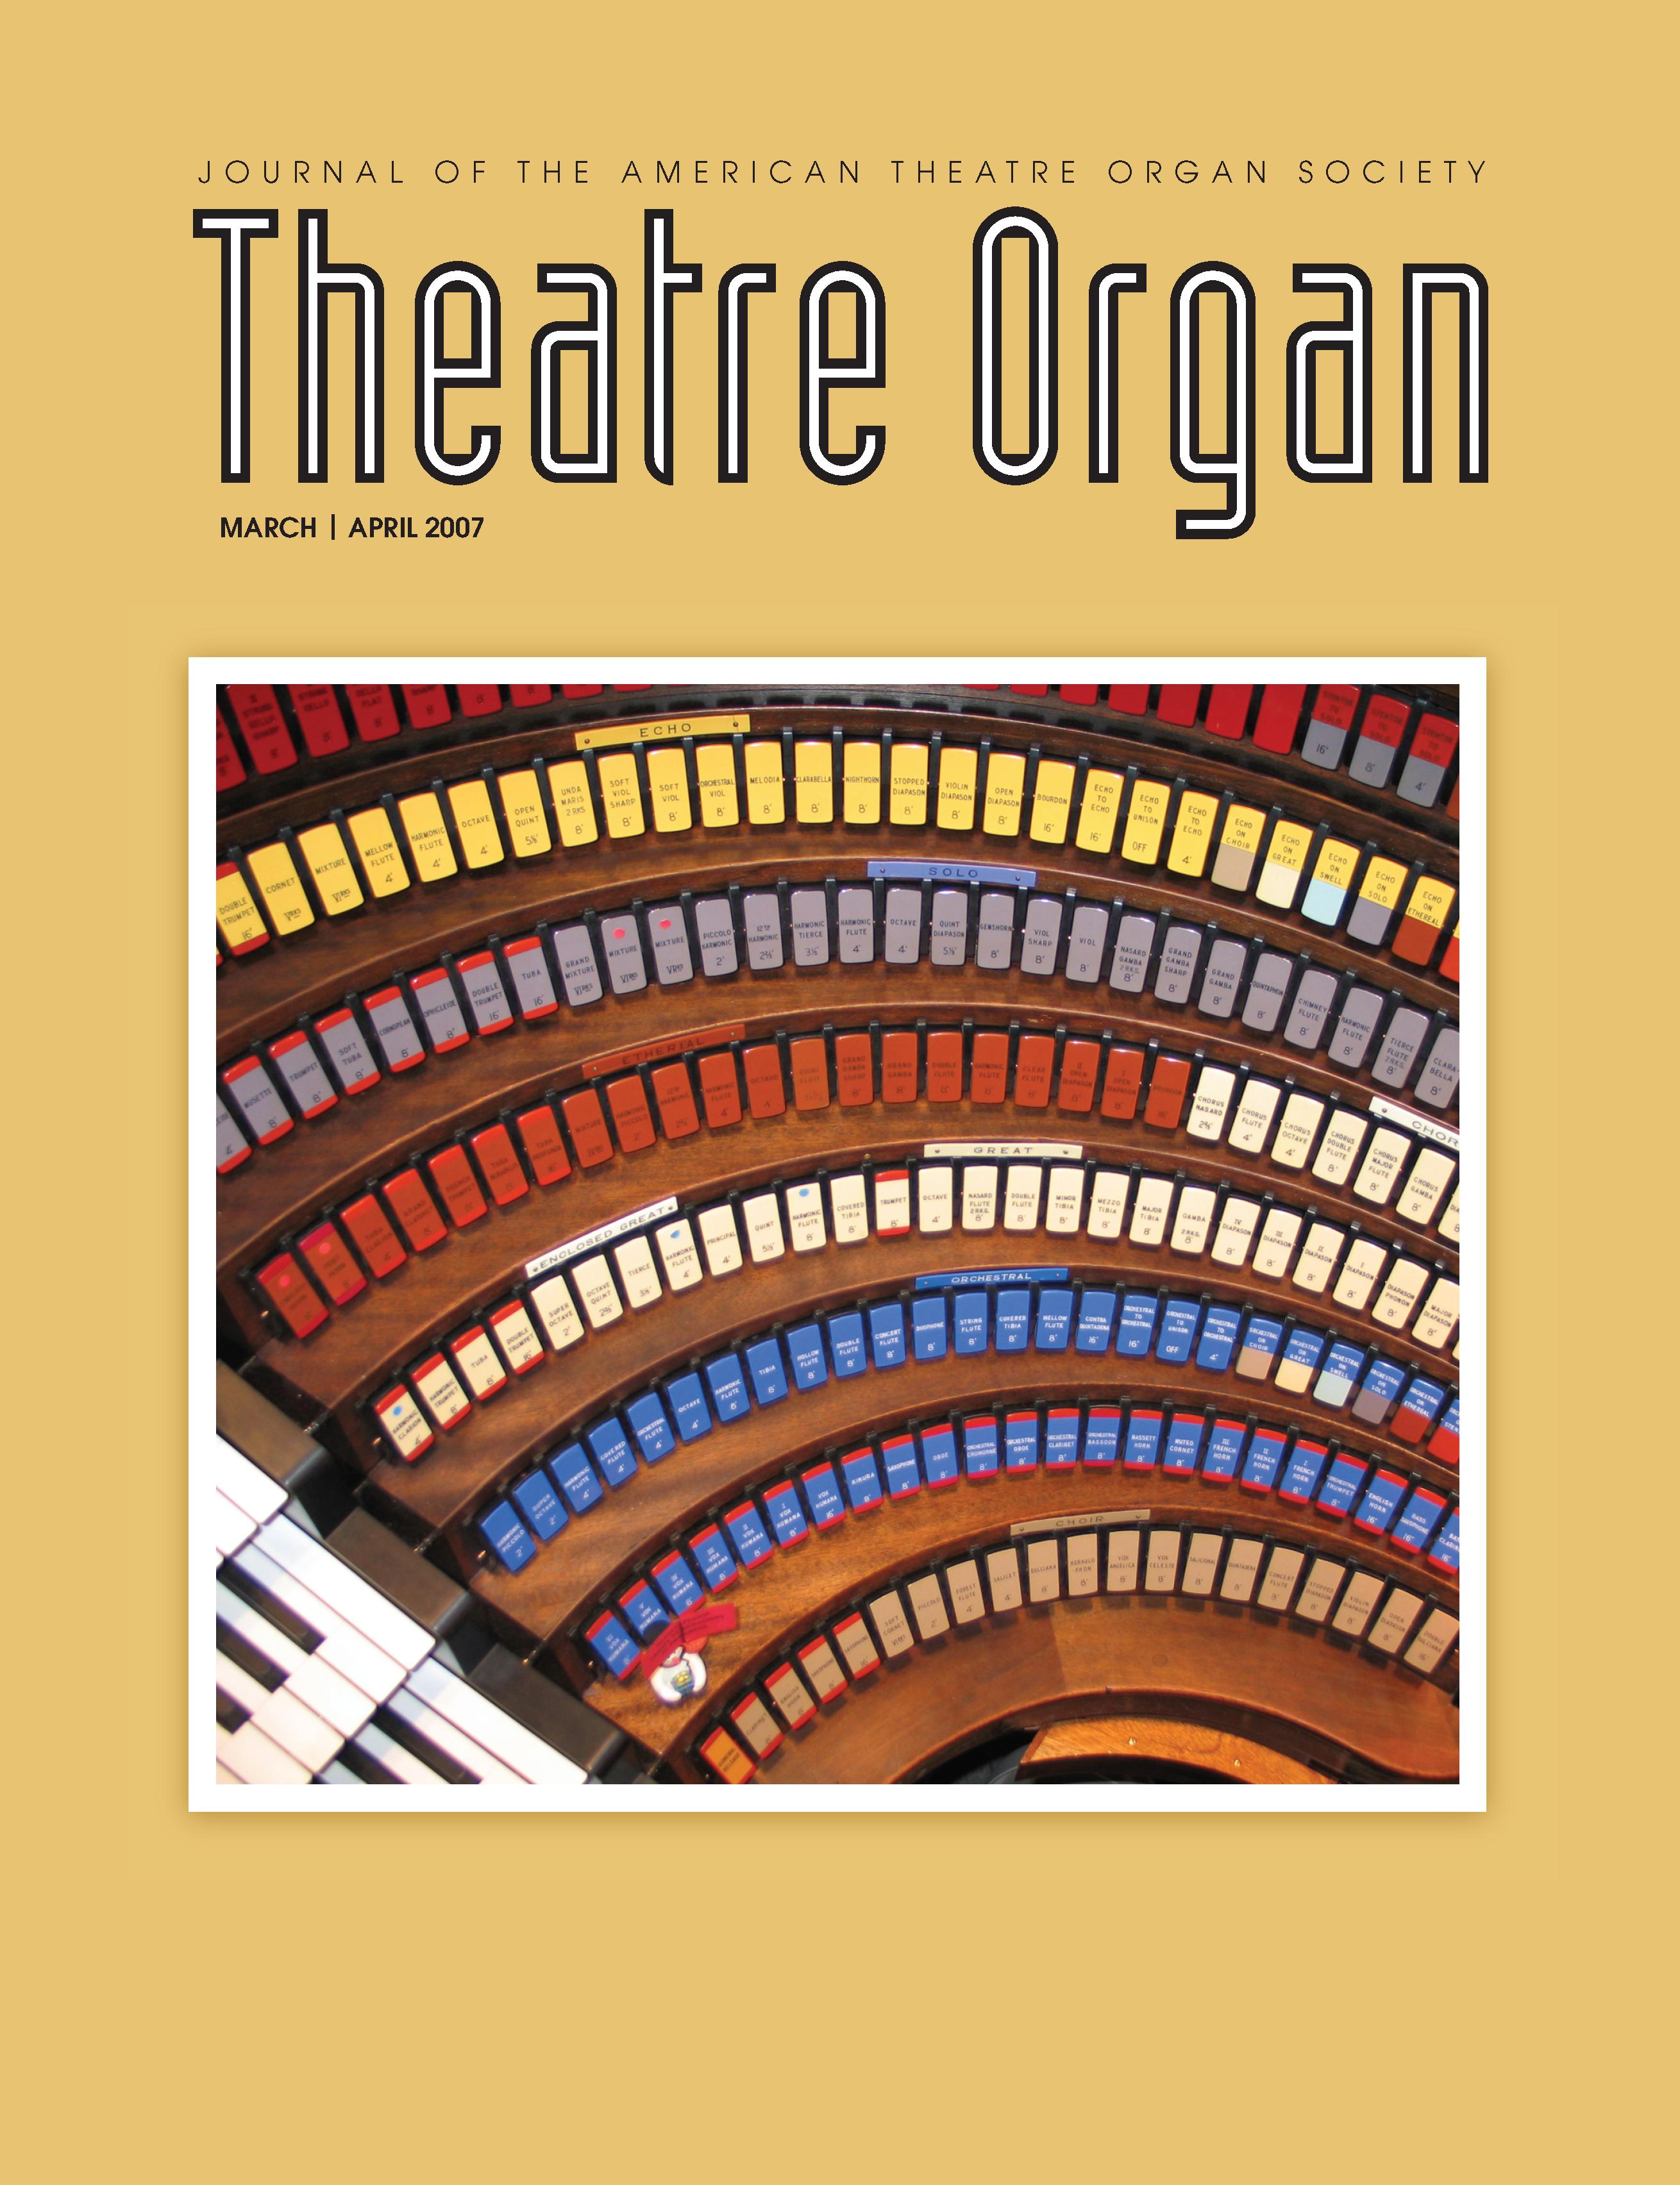 Theatre Organ, March - April 2007, Volume 49, Number 2